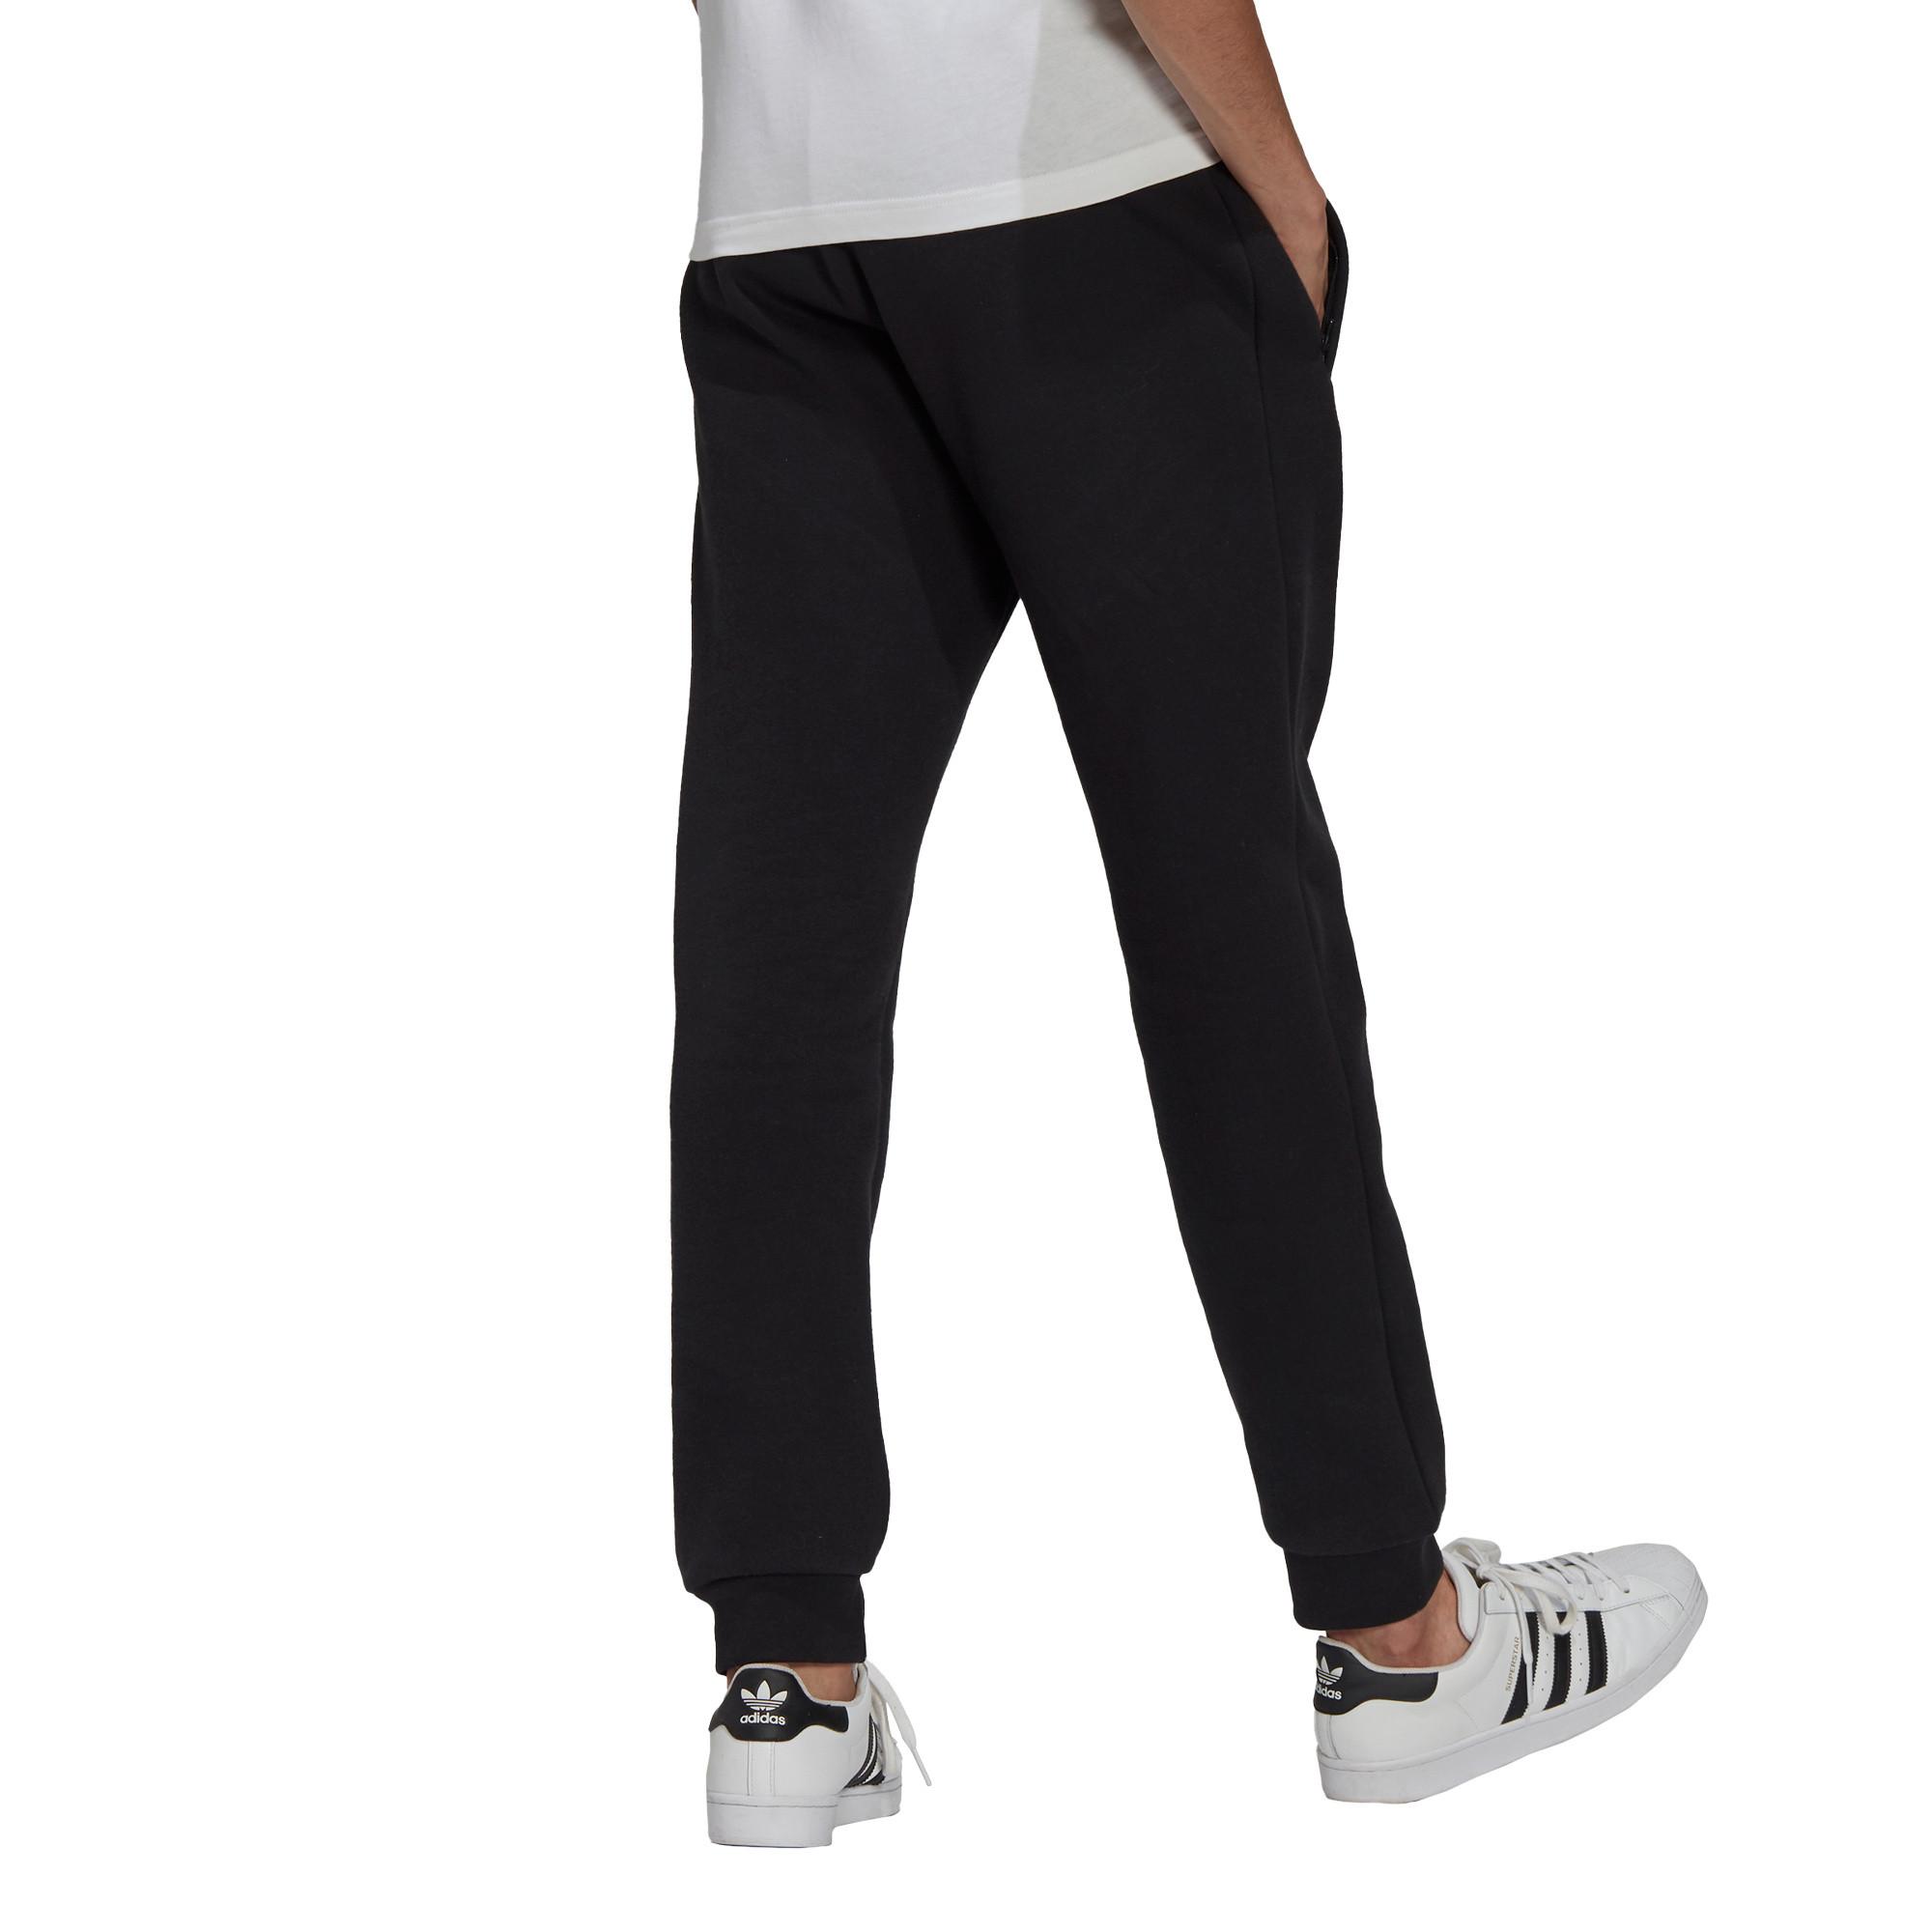 Pantaloni adicolor Essentials Trefoil, Nero, large image number 1